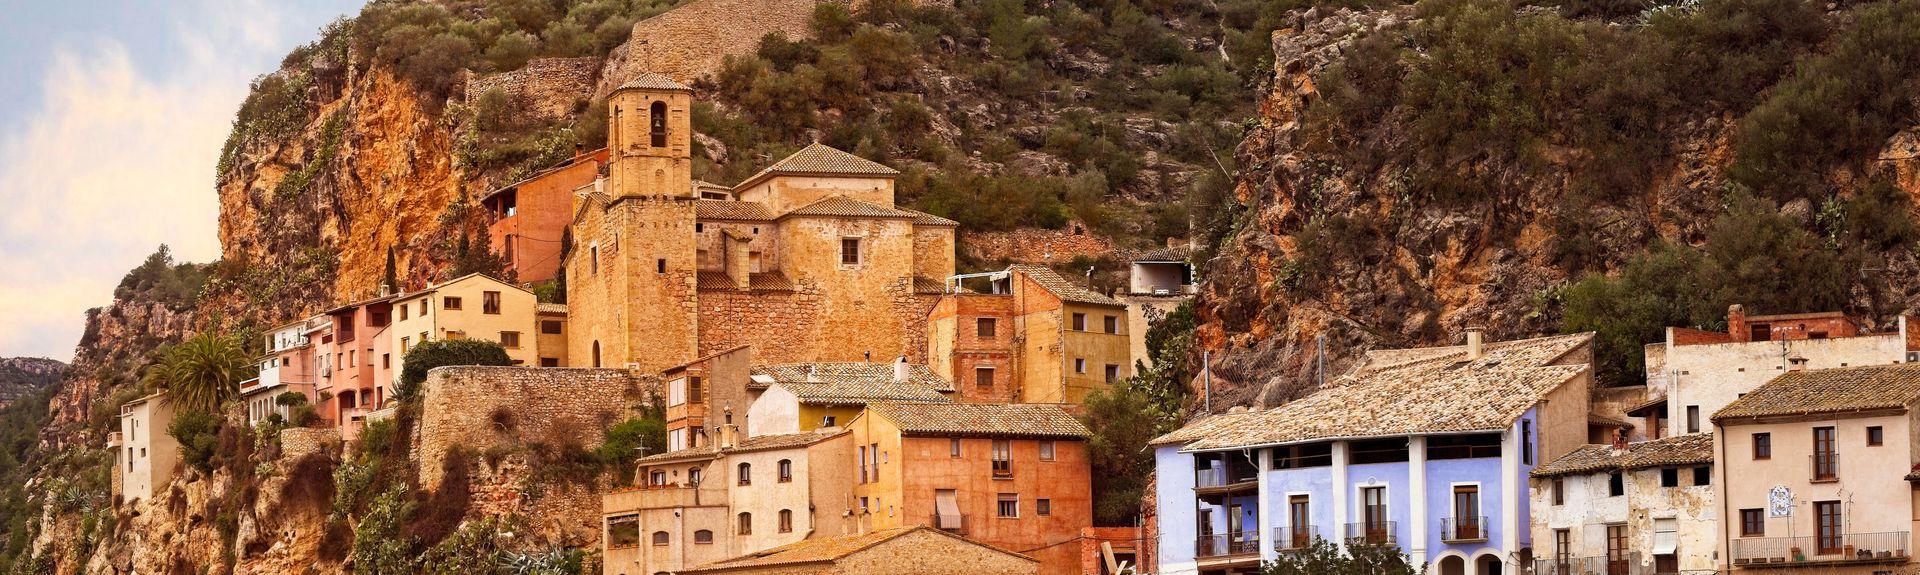 Miravet, Tarragona, Spain